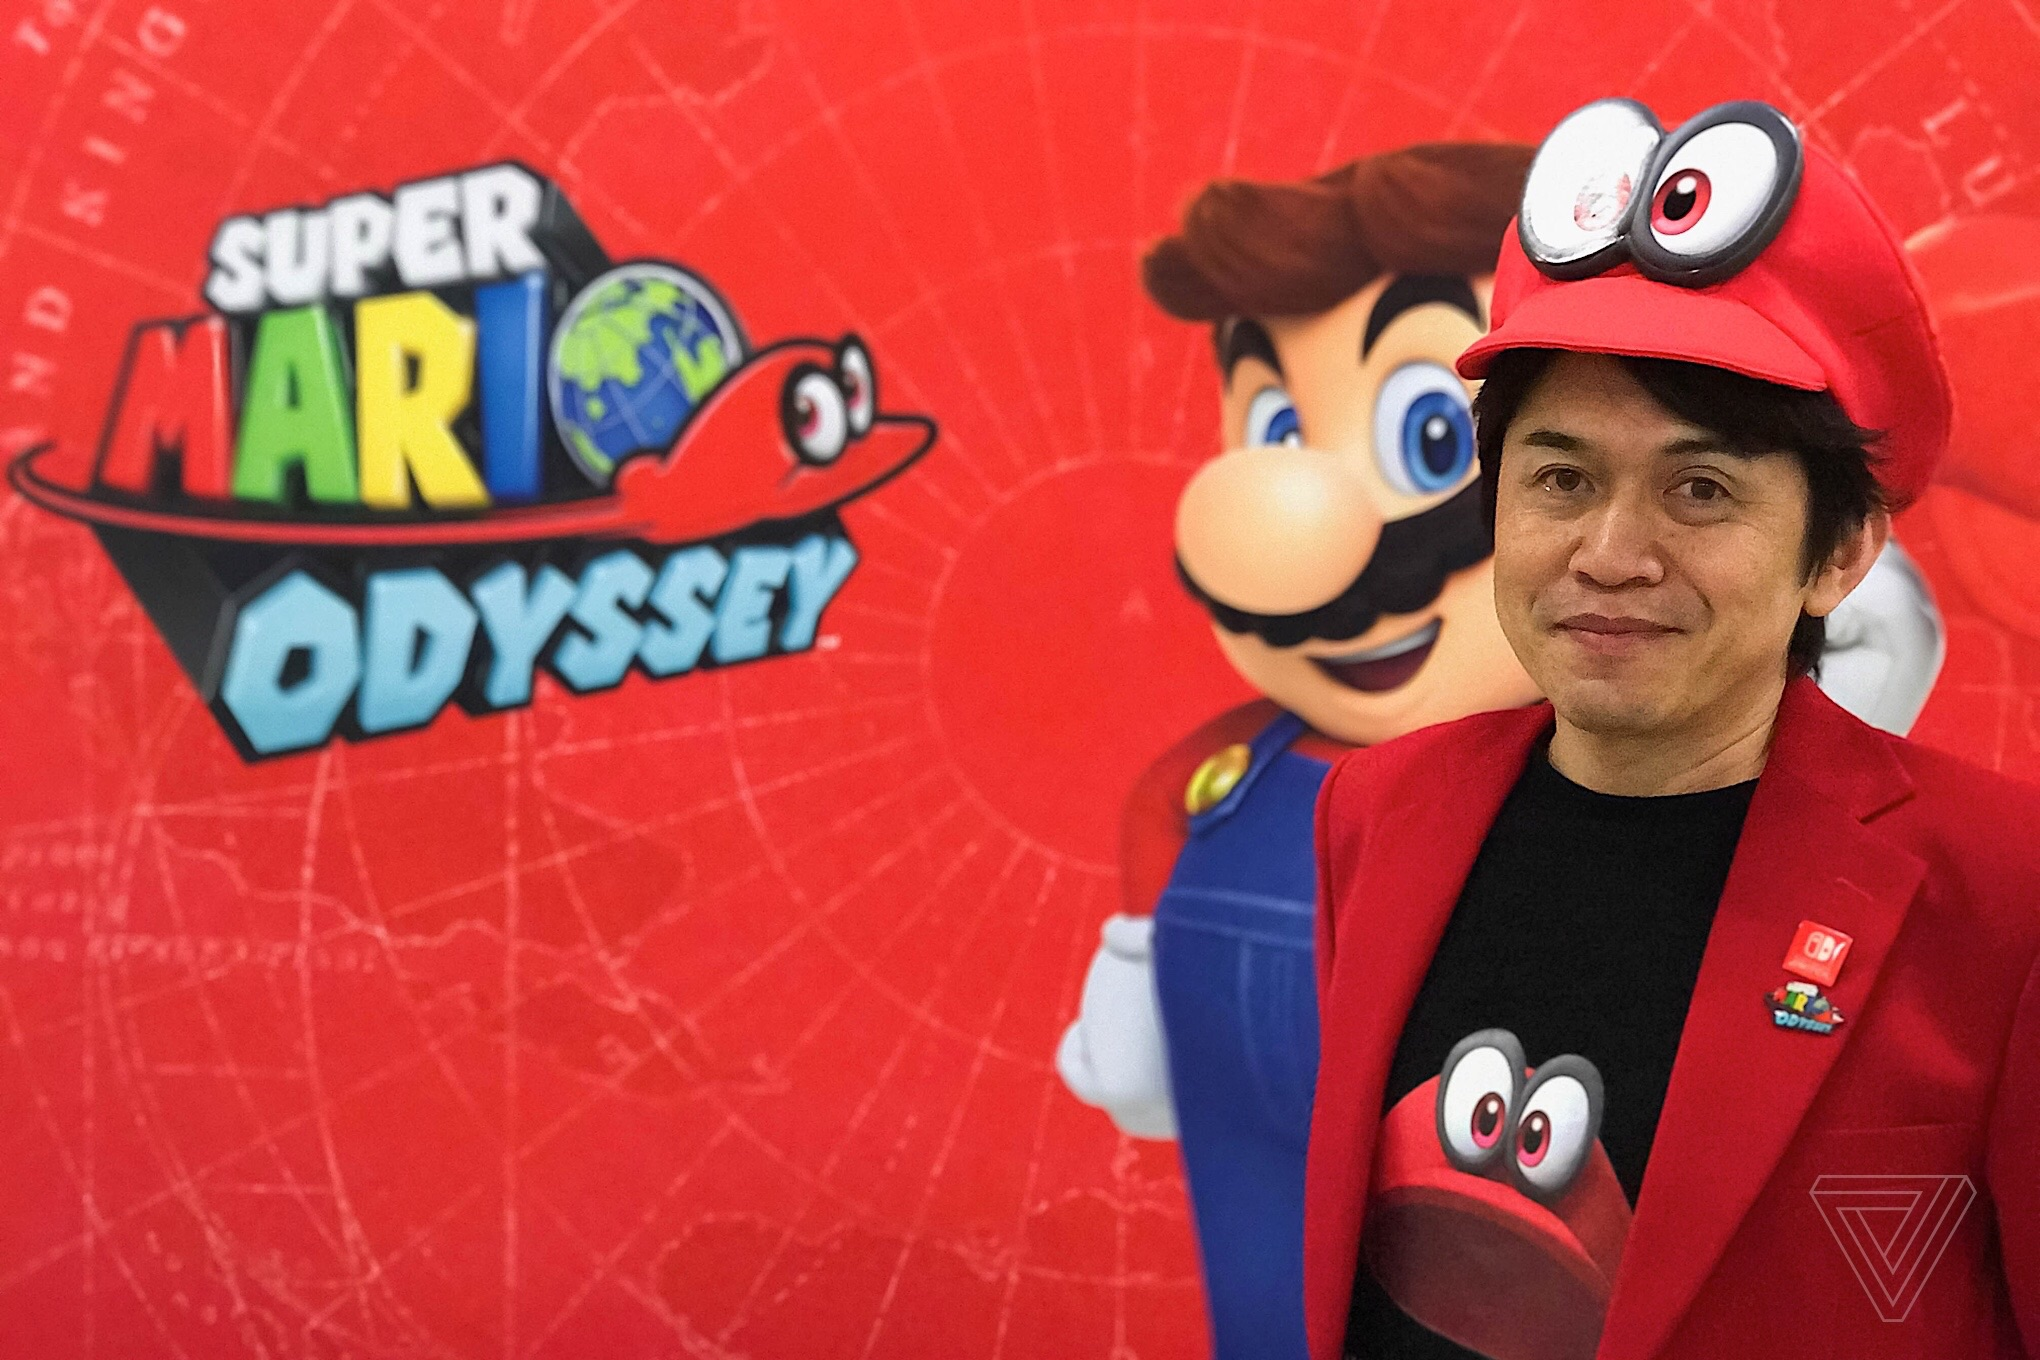 Super Mario Odyssey producer Yoshiaki Koizumi